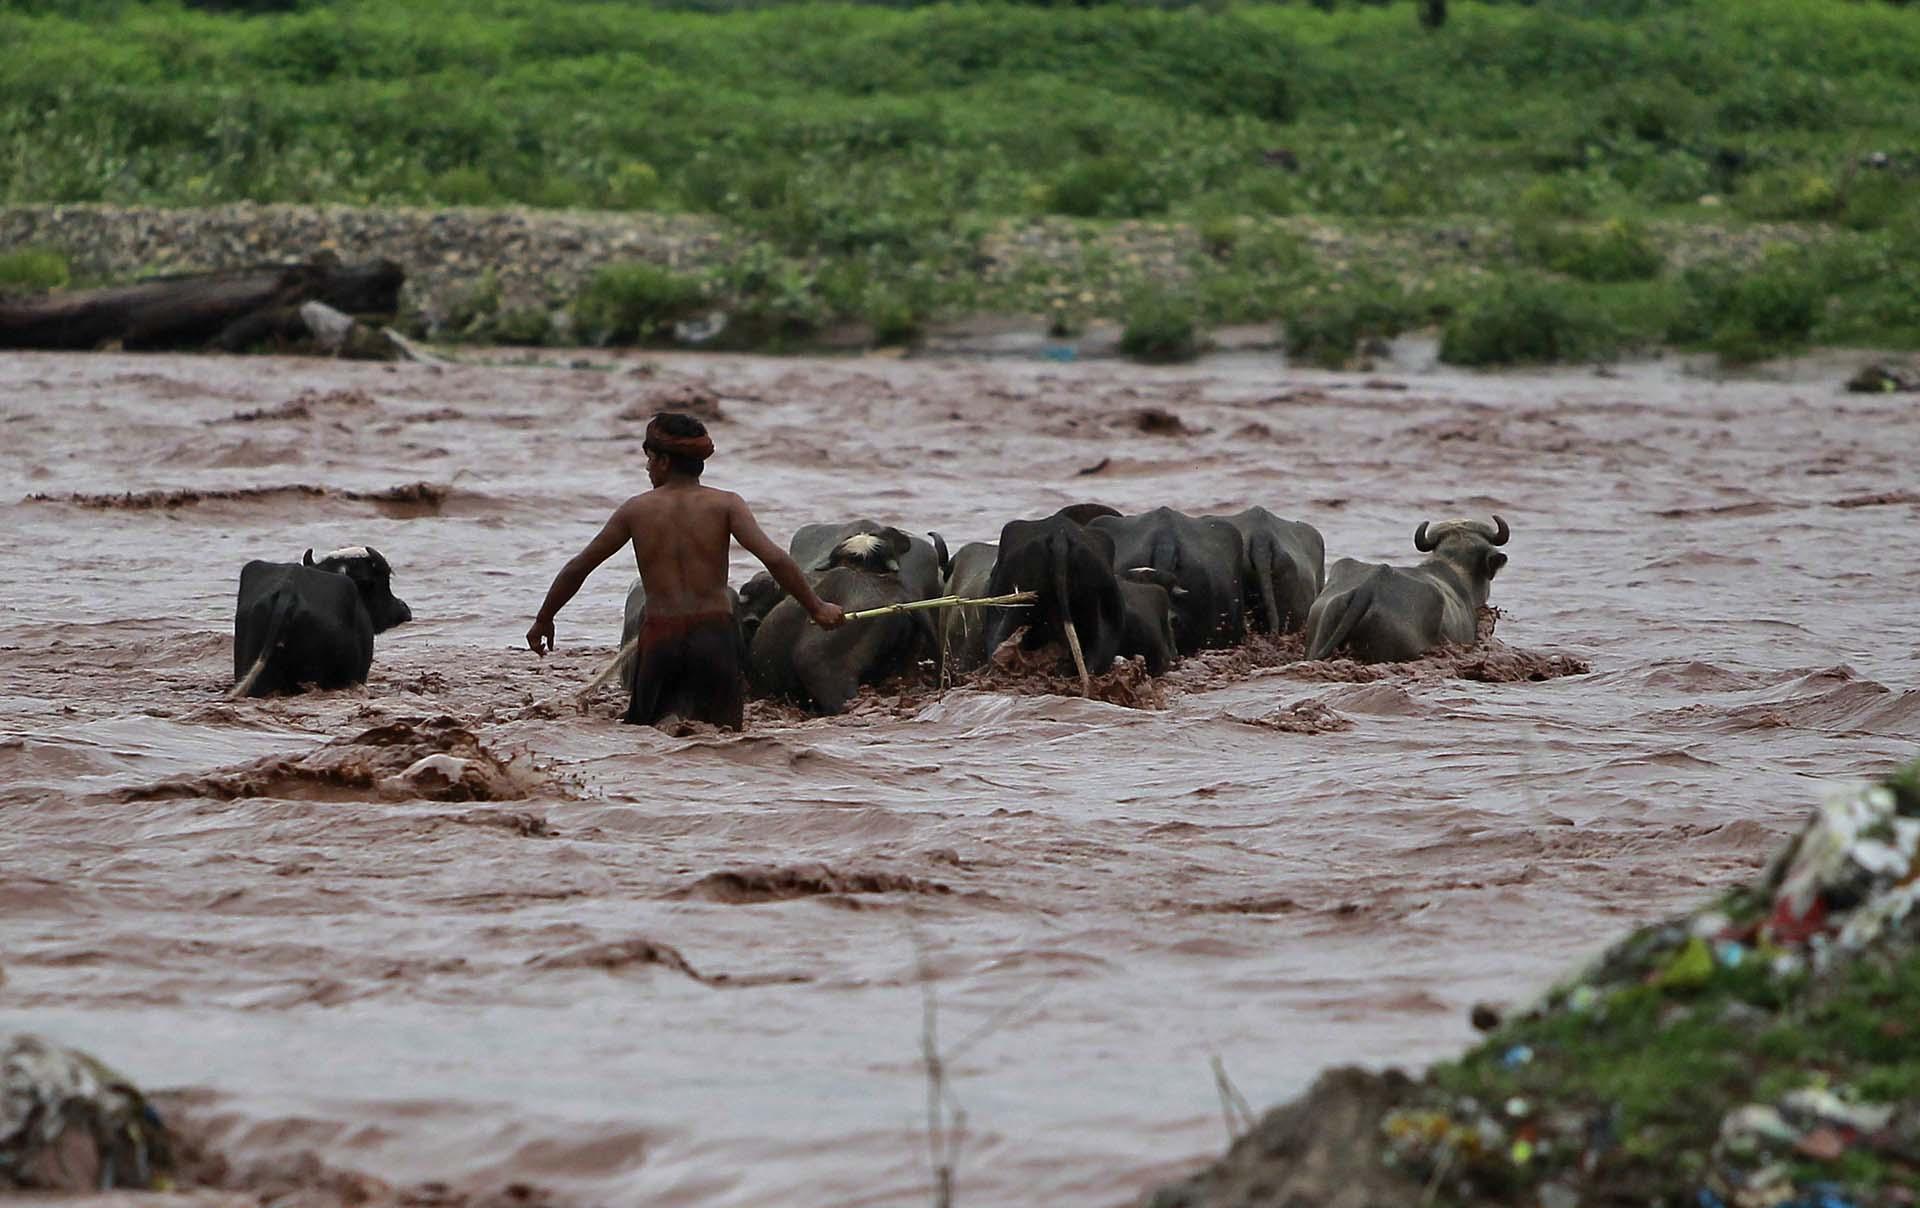 Un hombre saca a sus búfalos del agua (AP Photo/Channi Anand)